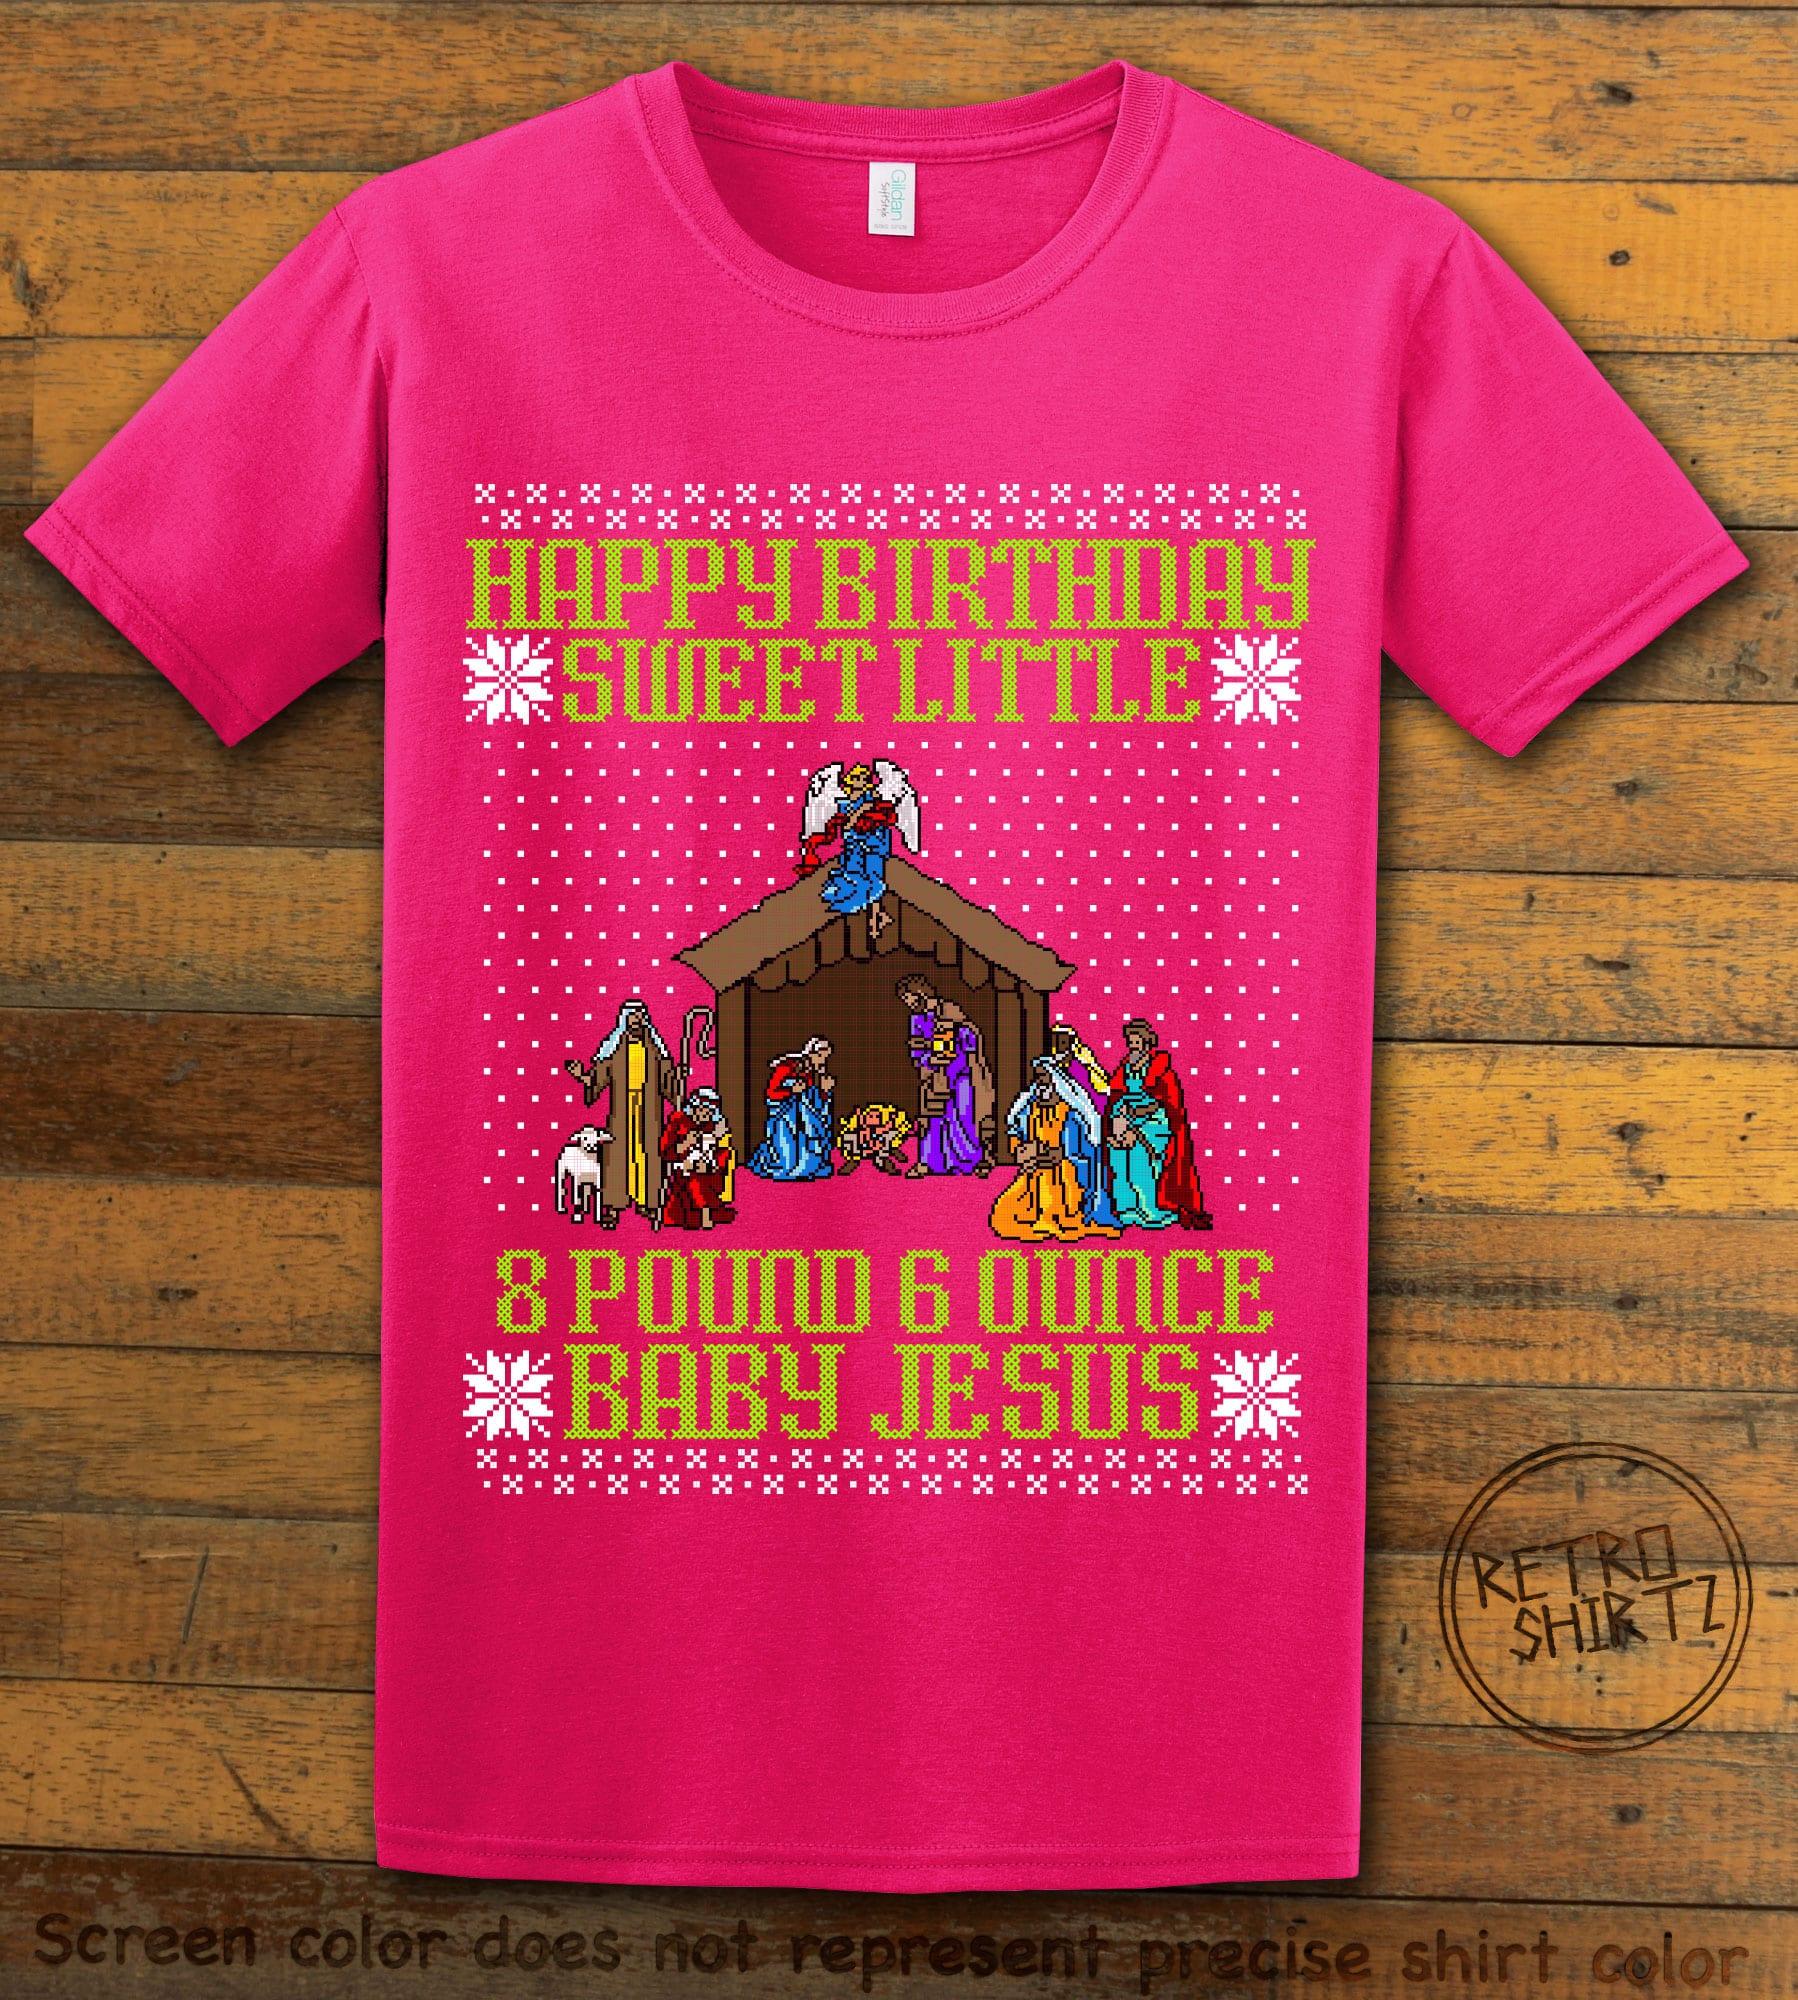 Happy Birthday Sweet Little Baby Jesus Christmas Graphic T-Shirt - pink shirt design